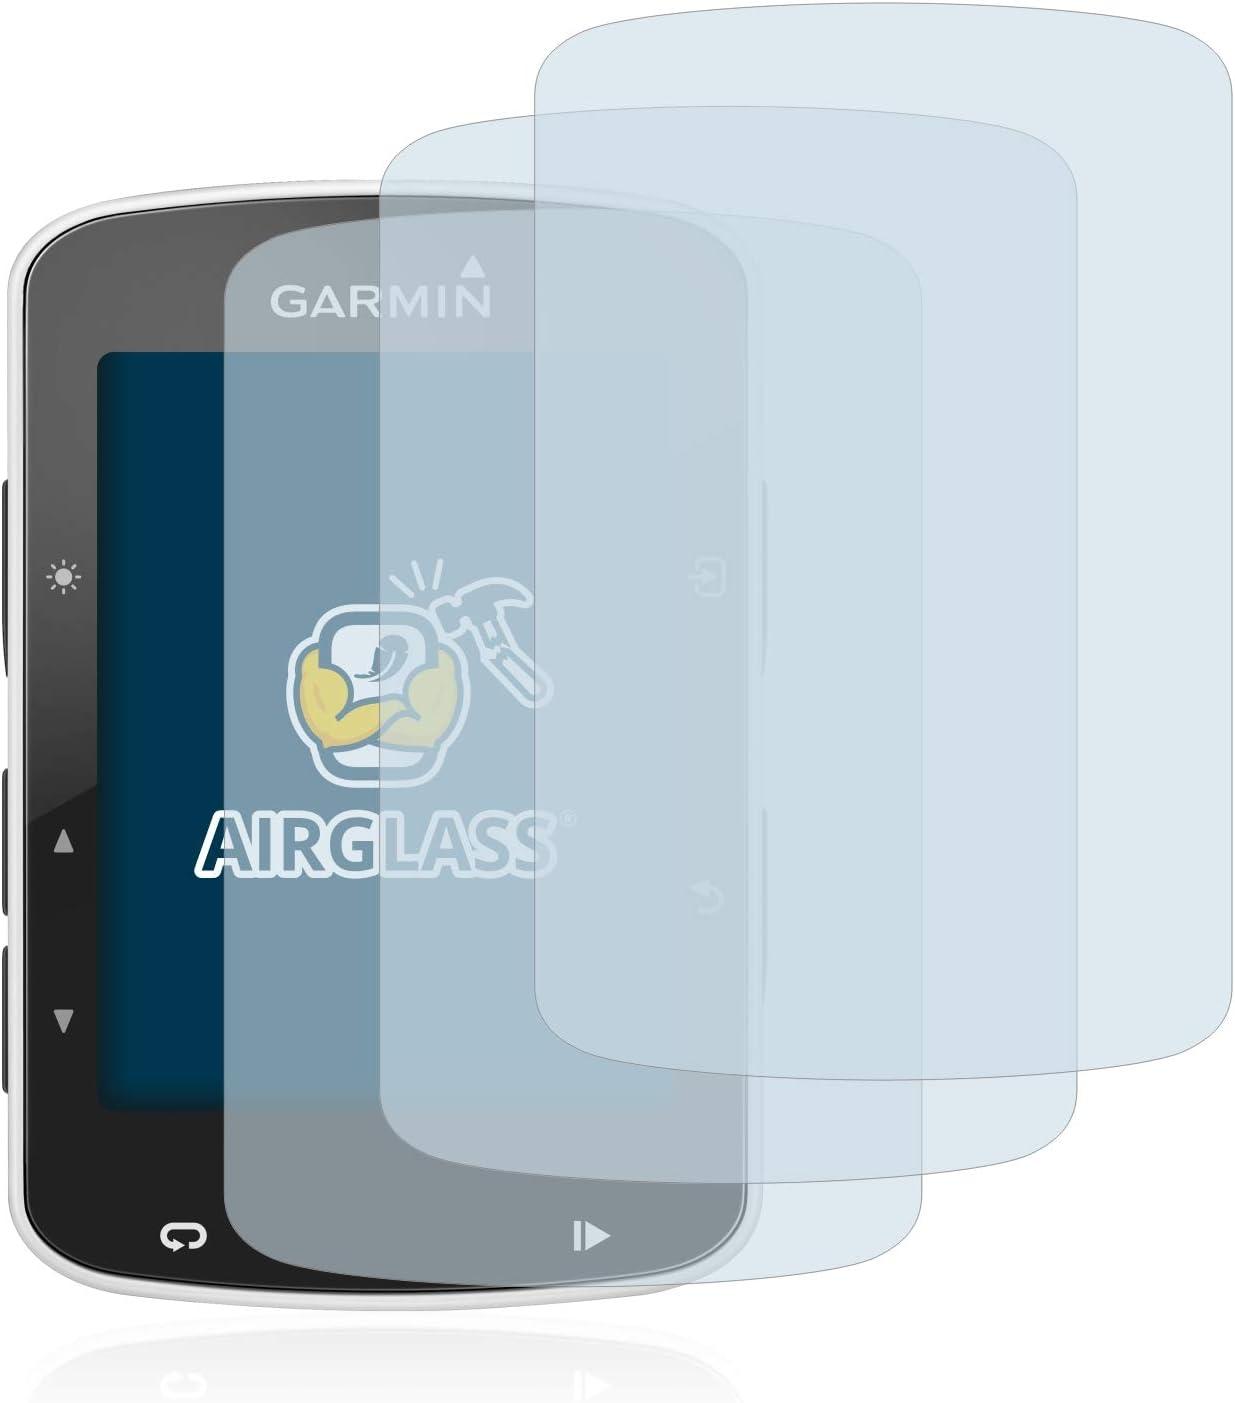 3 St/ück Anti-Fingerprint HD-Clear - AirGlass BROTECT Panzerglas Schutzfolie kompatibel mit Garmin Edge 820 9H H/ärte